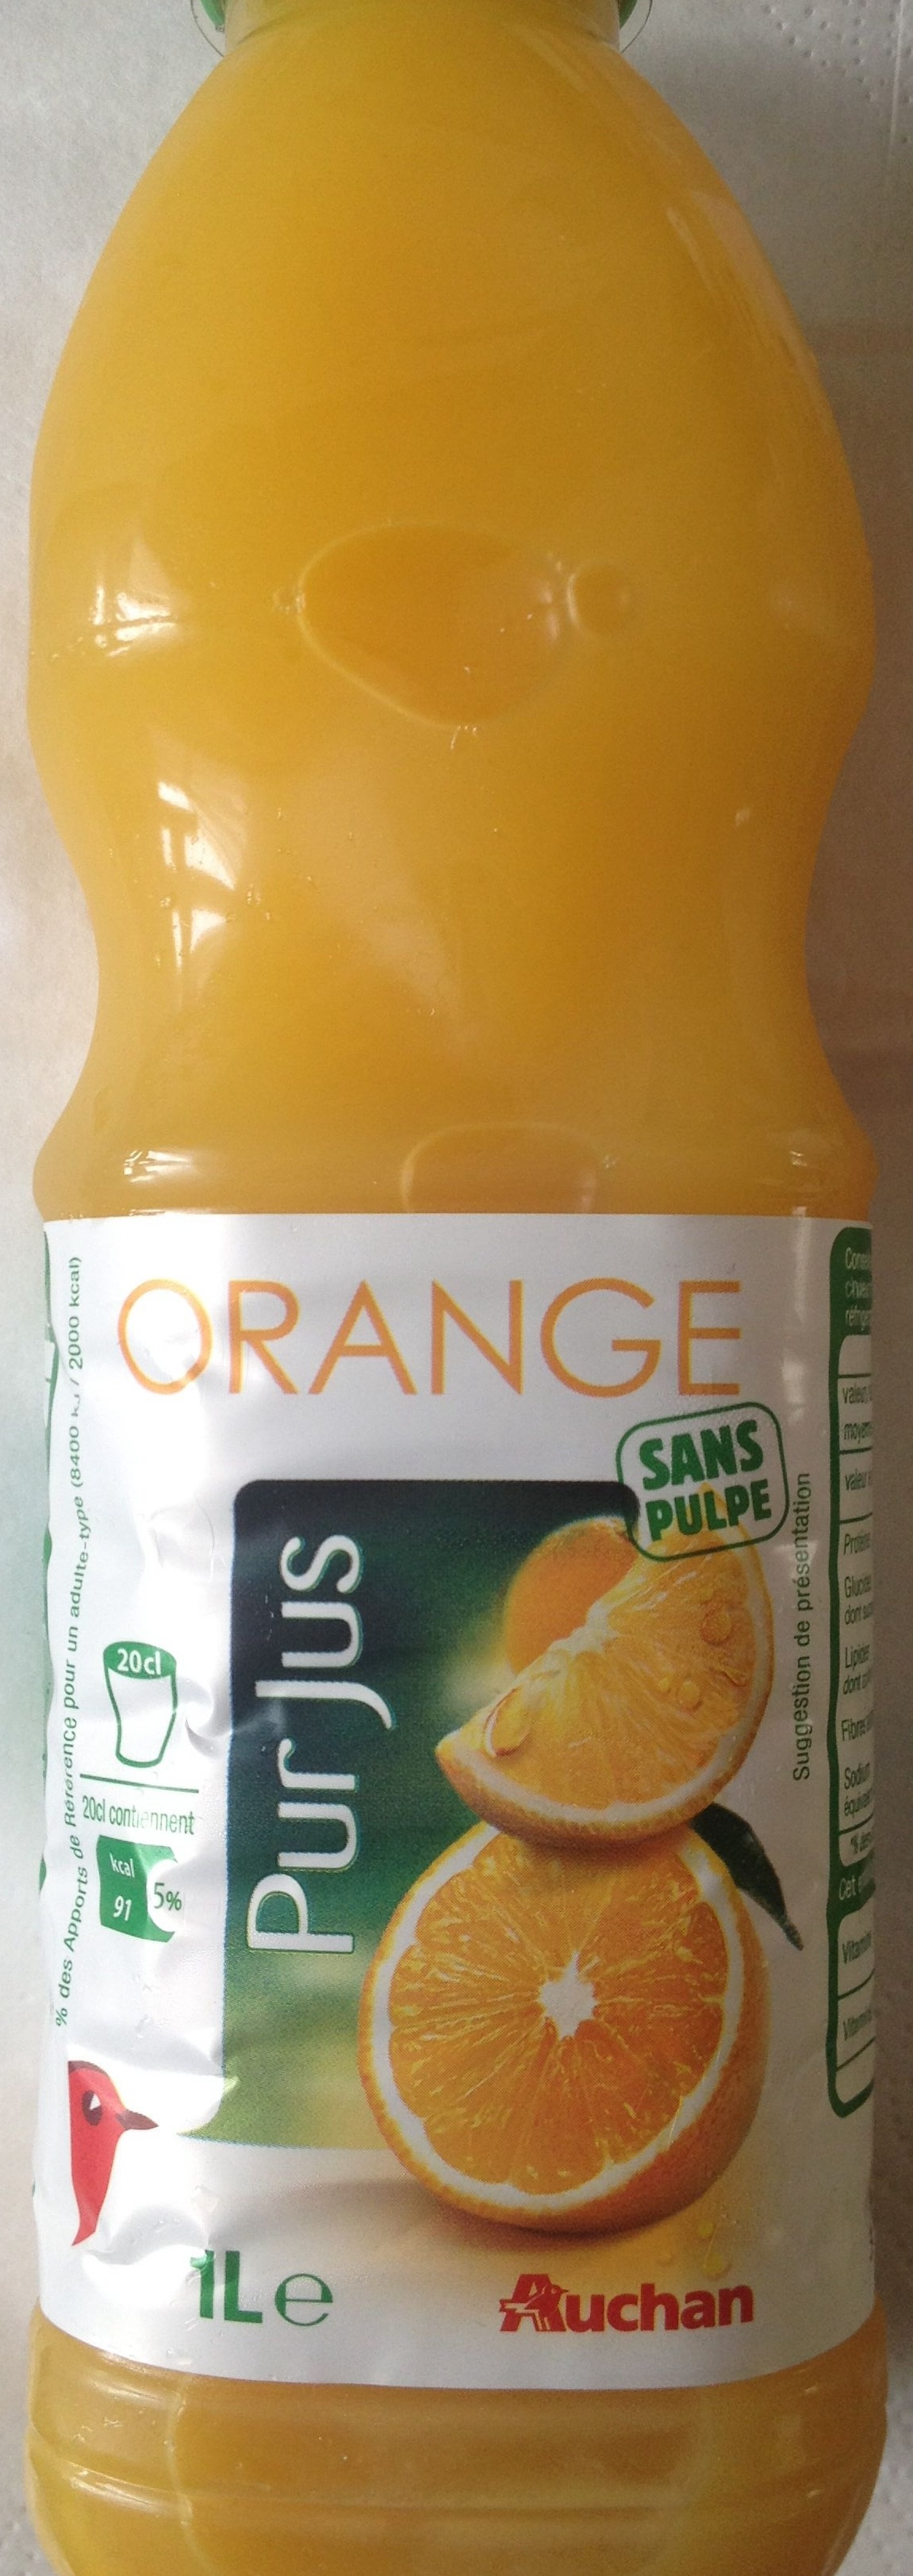 Orange, Pur Jus (Sans pulpe) - Product